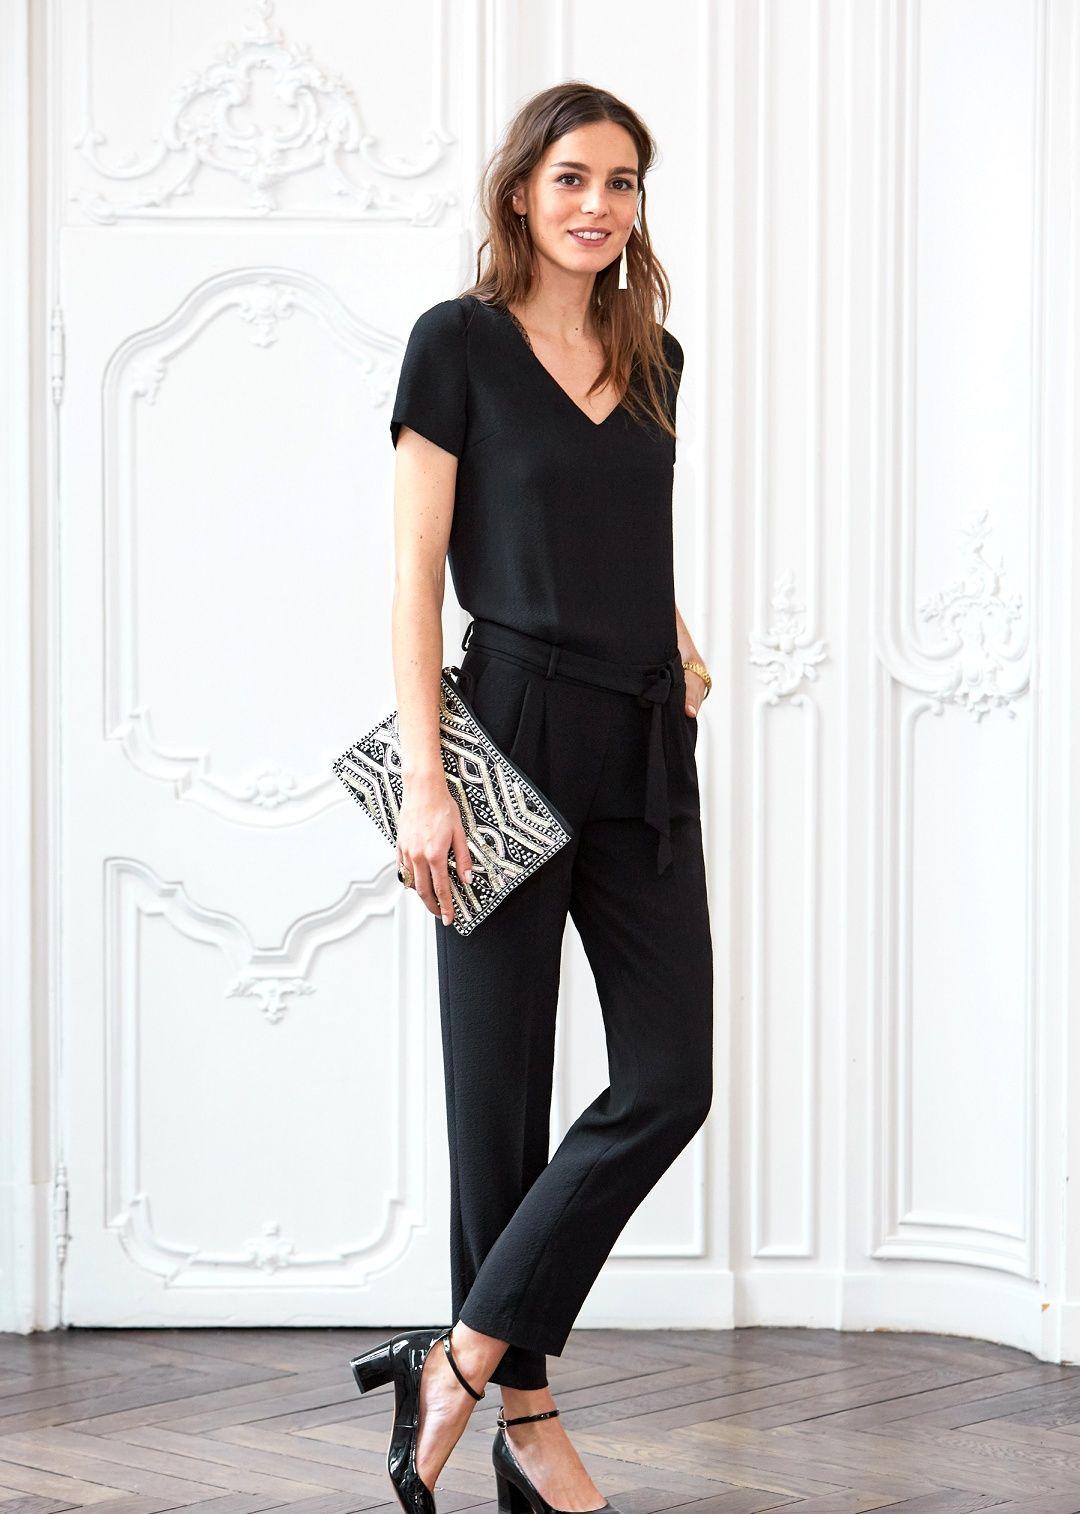 s zane combinaison moe outfits pinterest mode sezane et tenue. Black Bedroom Furniture Sets. Home Design Ideas